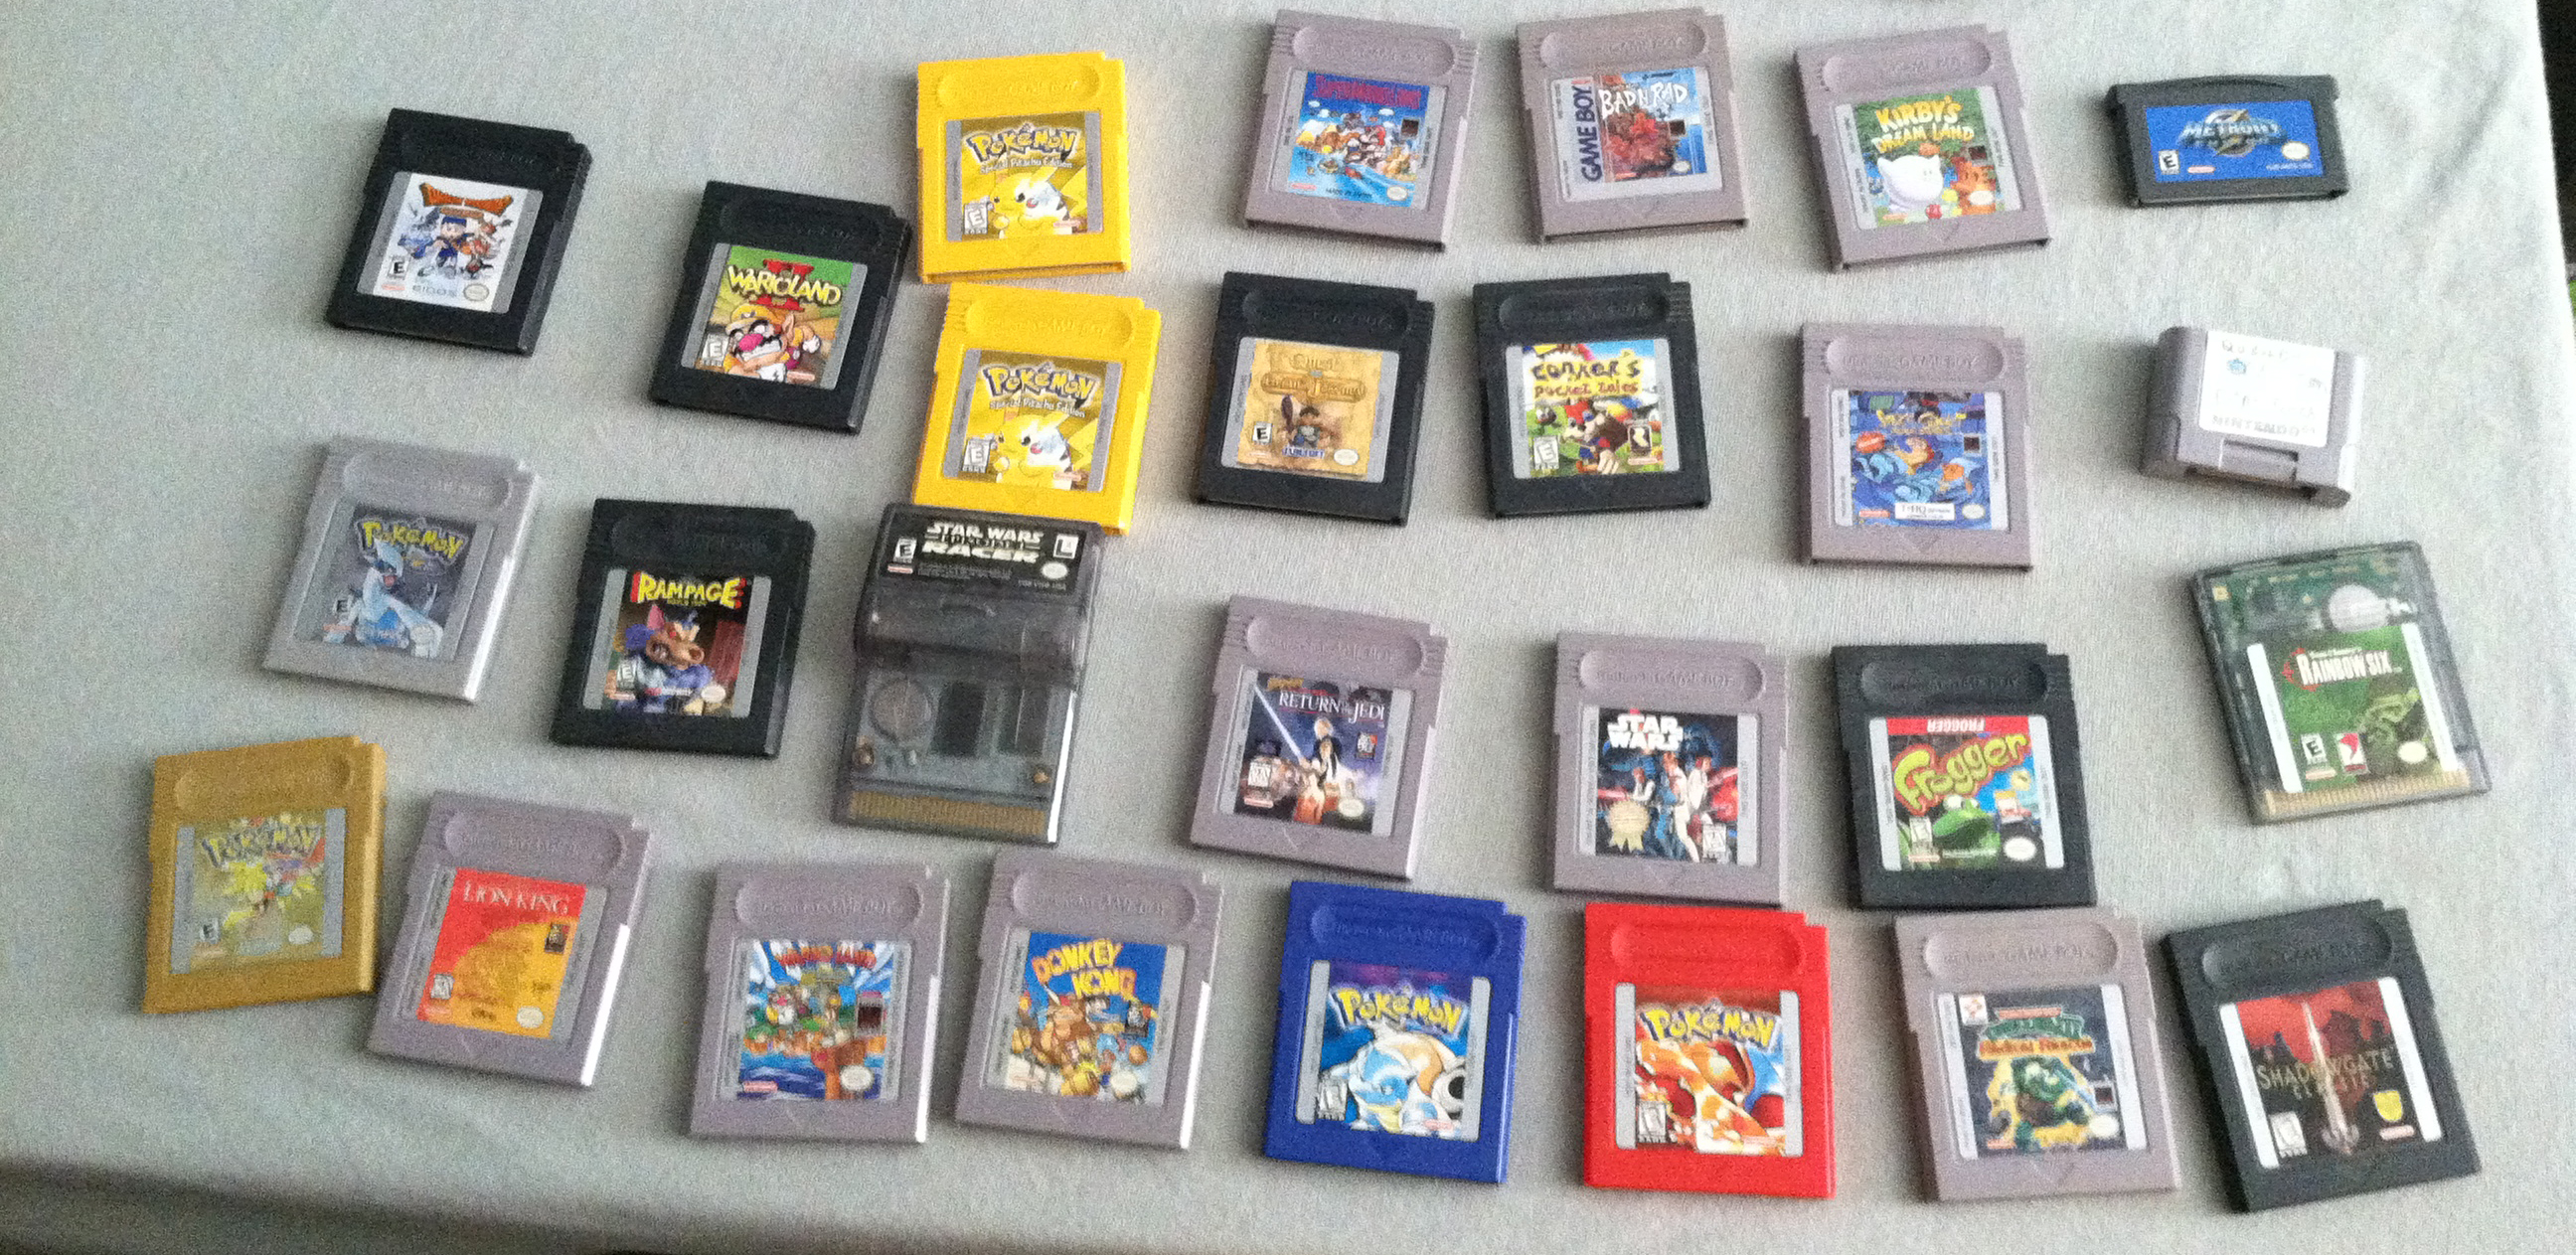 old-gameboy-games.png